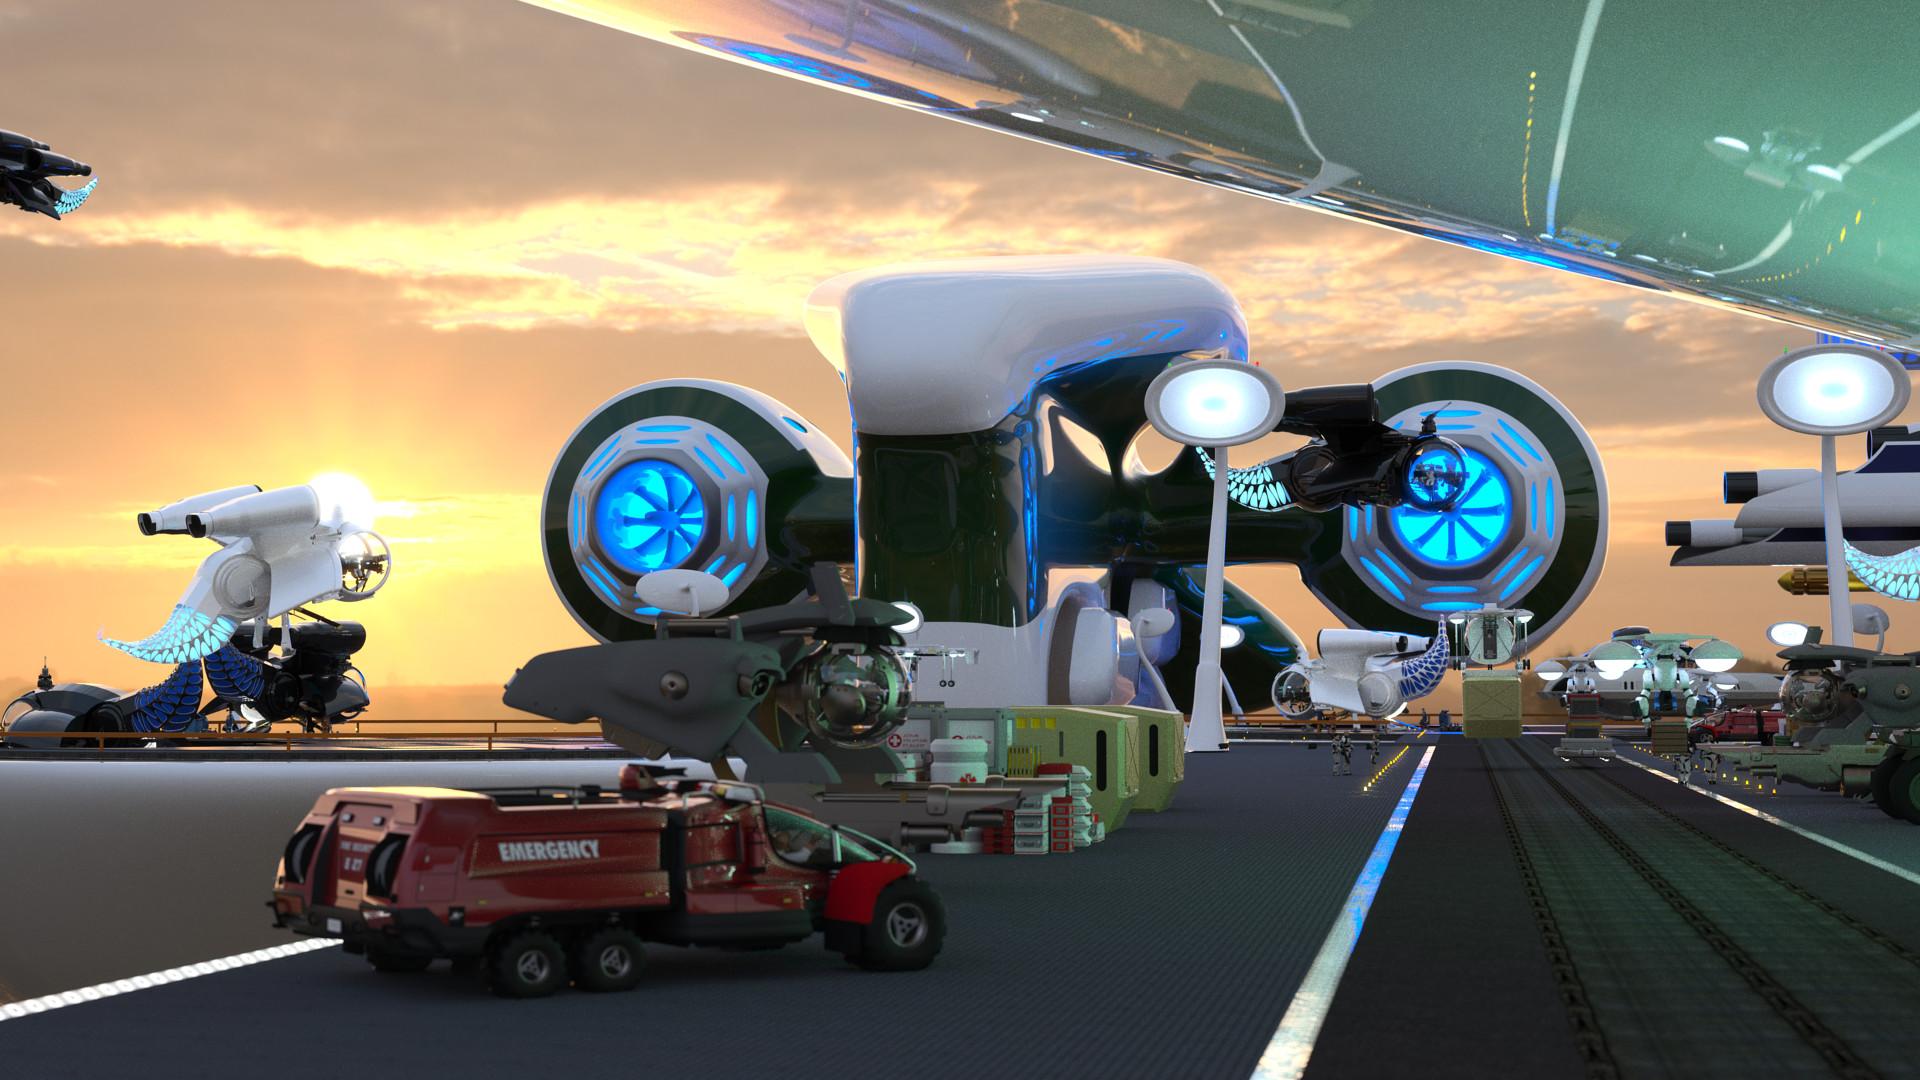 Duane kemp new city docks transfer full scale camera transfer subd2018 scene 63a